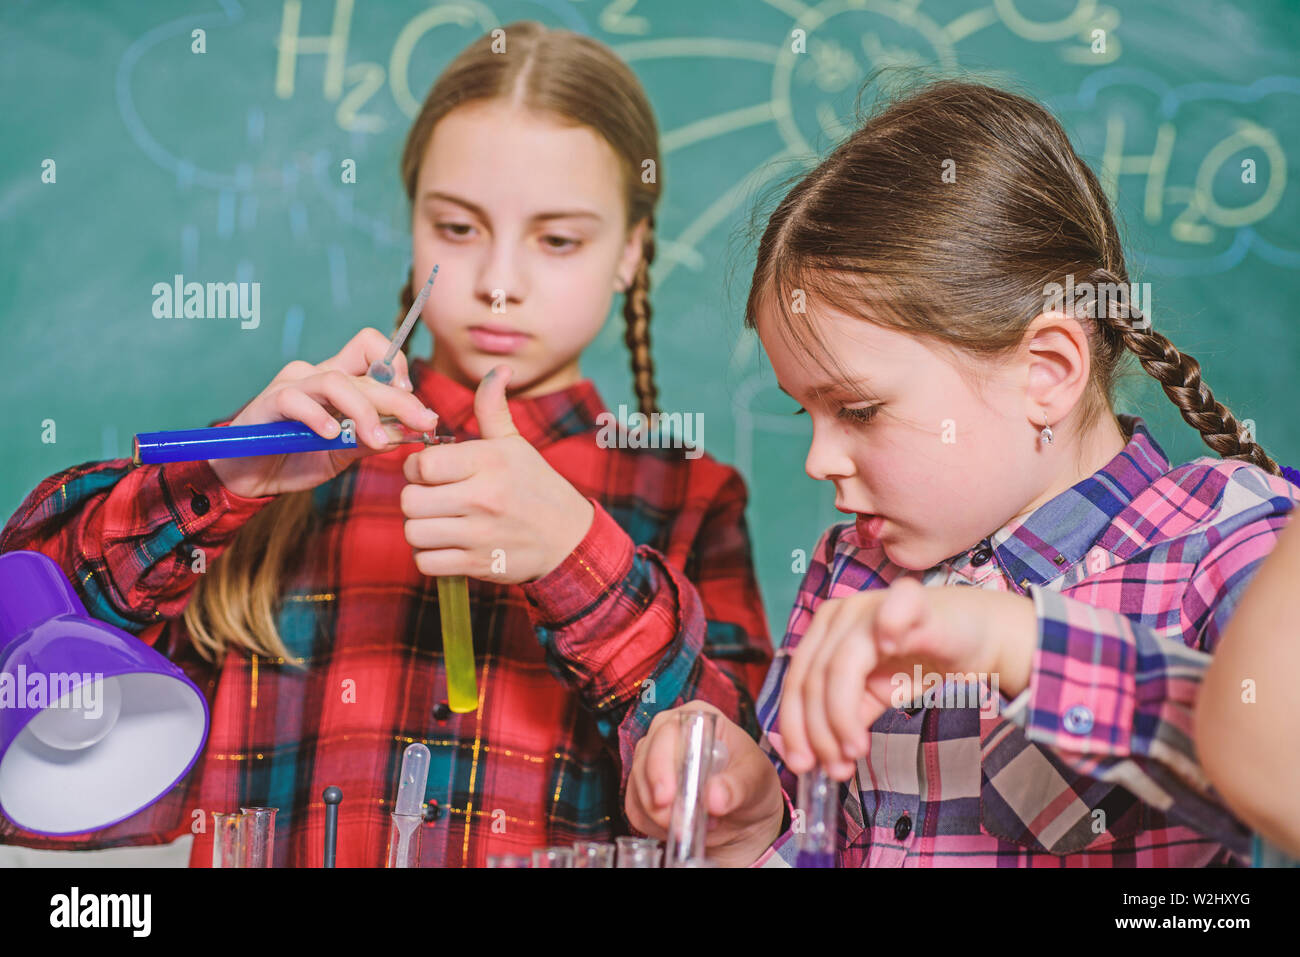 School classes. Kids adorable friends having fun in school. School chemistry lab concept. Practicum based teacher professional development program. Practical knowledge. Child care and development. - Stock Image